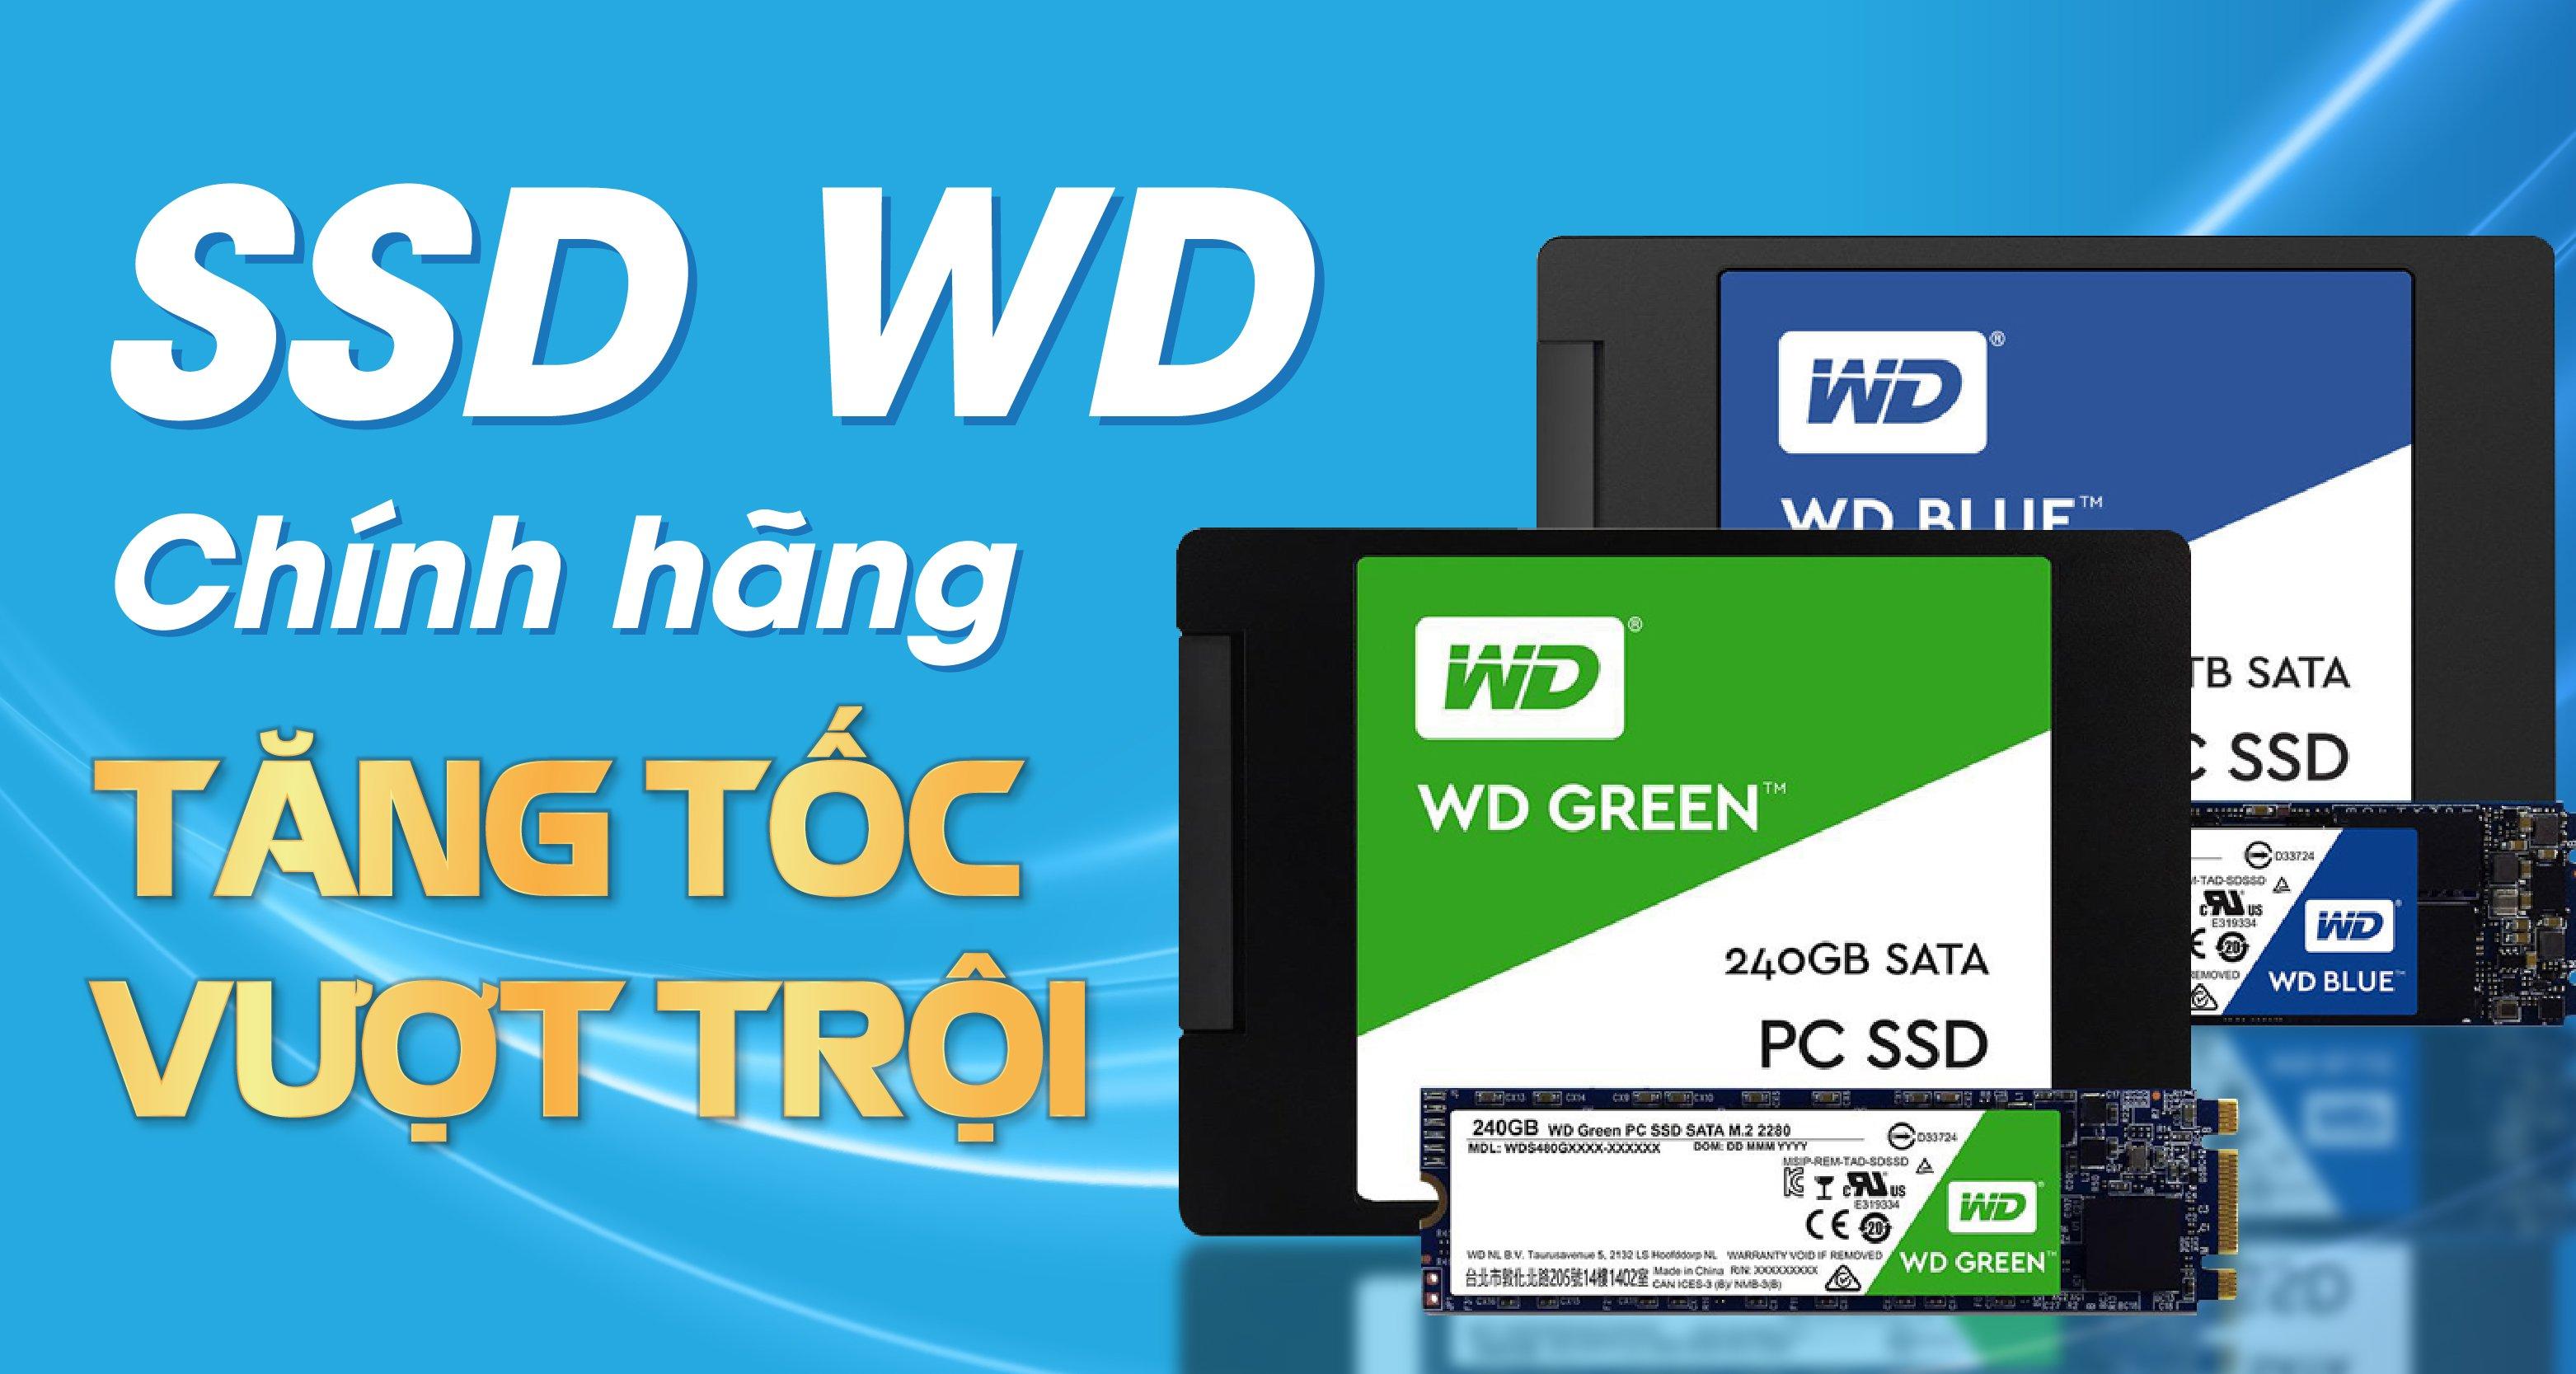 Ô cứng Western Digital siêu rẻ